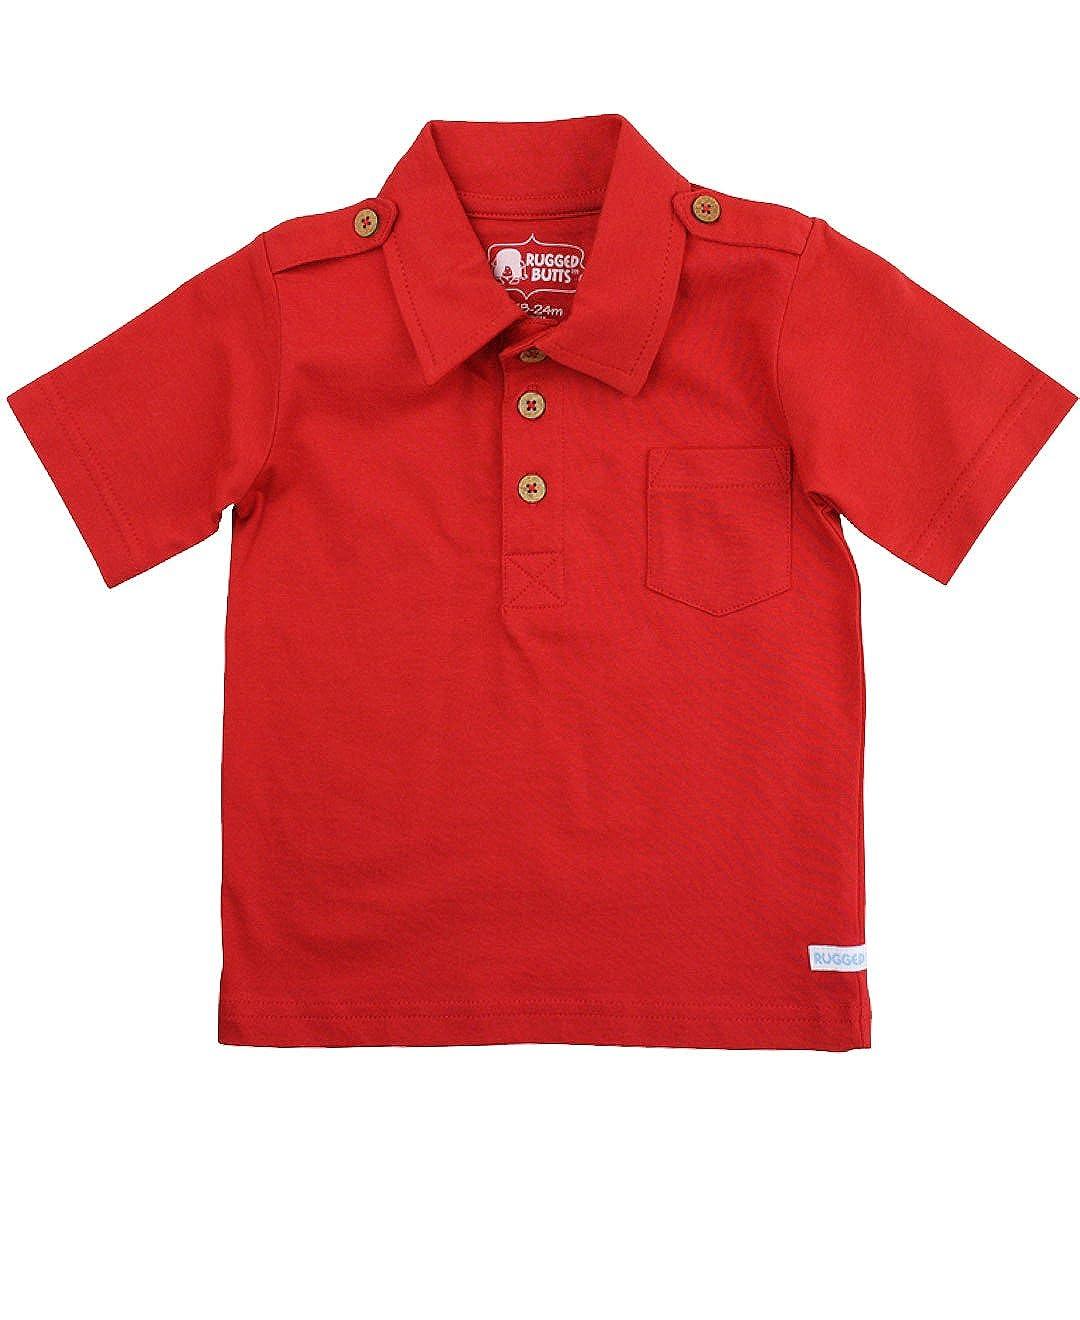 RuggedButts Baby/Toddler Boys Short Sleeve Polo Pocket BSKYYXX-1PPL-SC-BABY